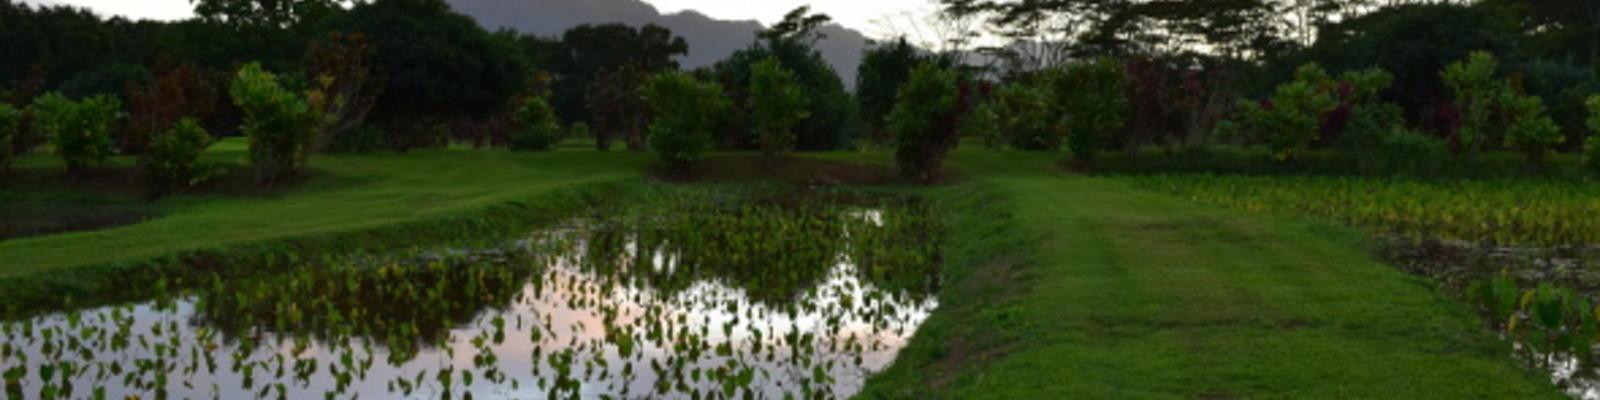 taste the real hawaii on the garden island of kauai - The Garden Island